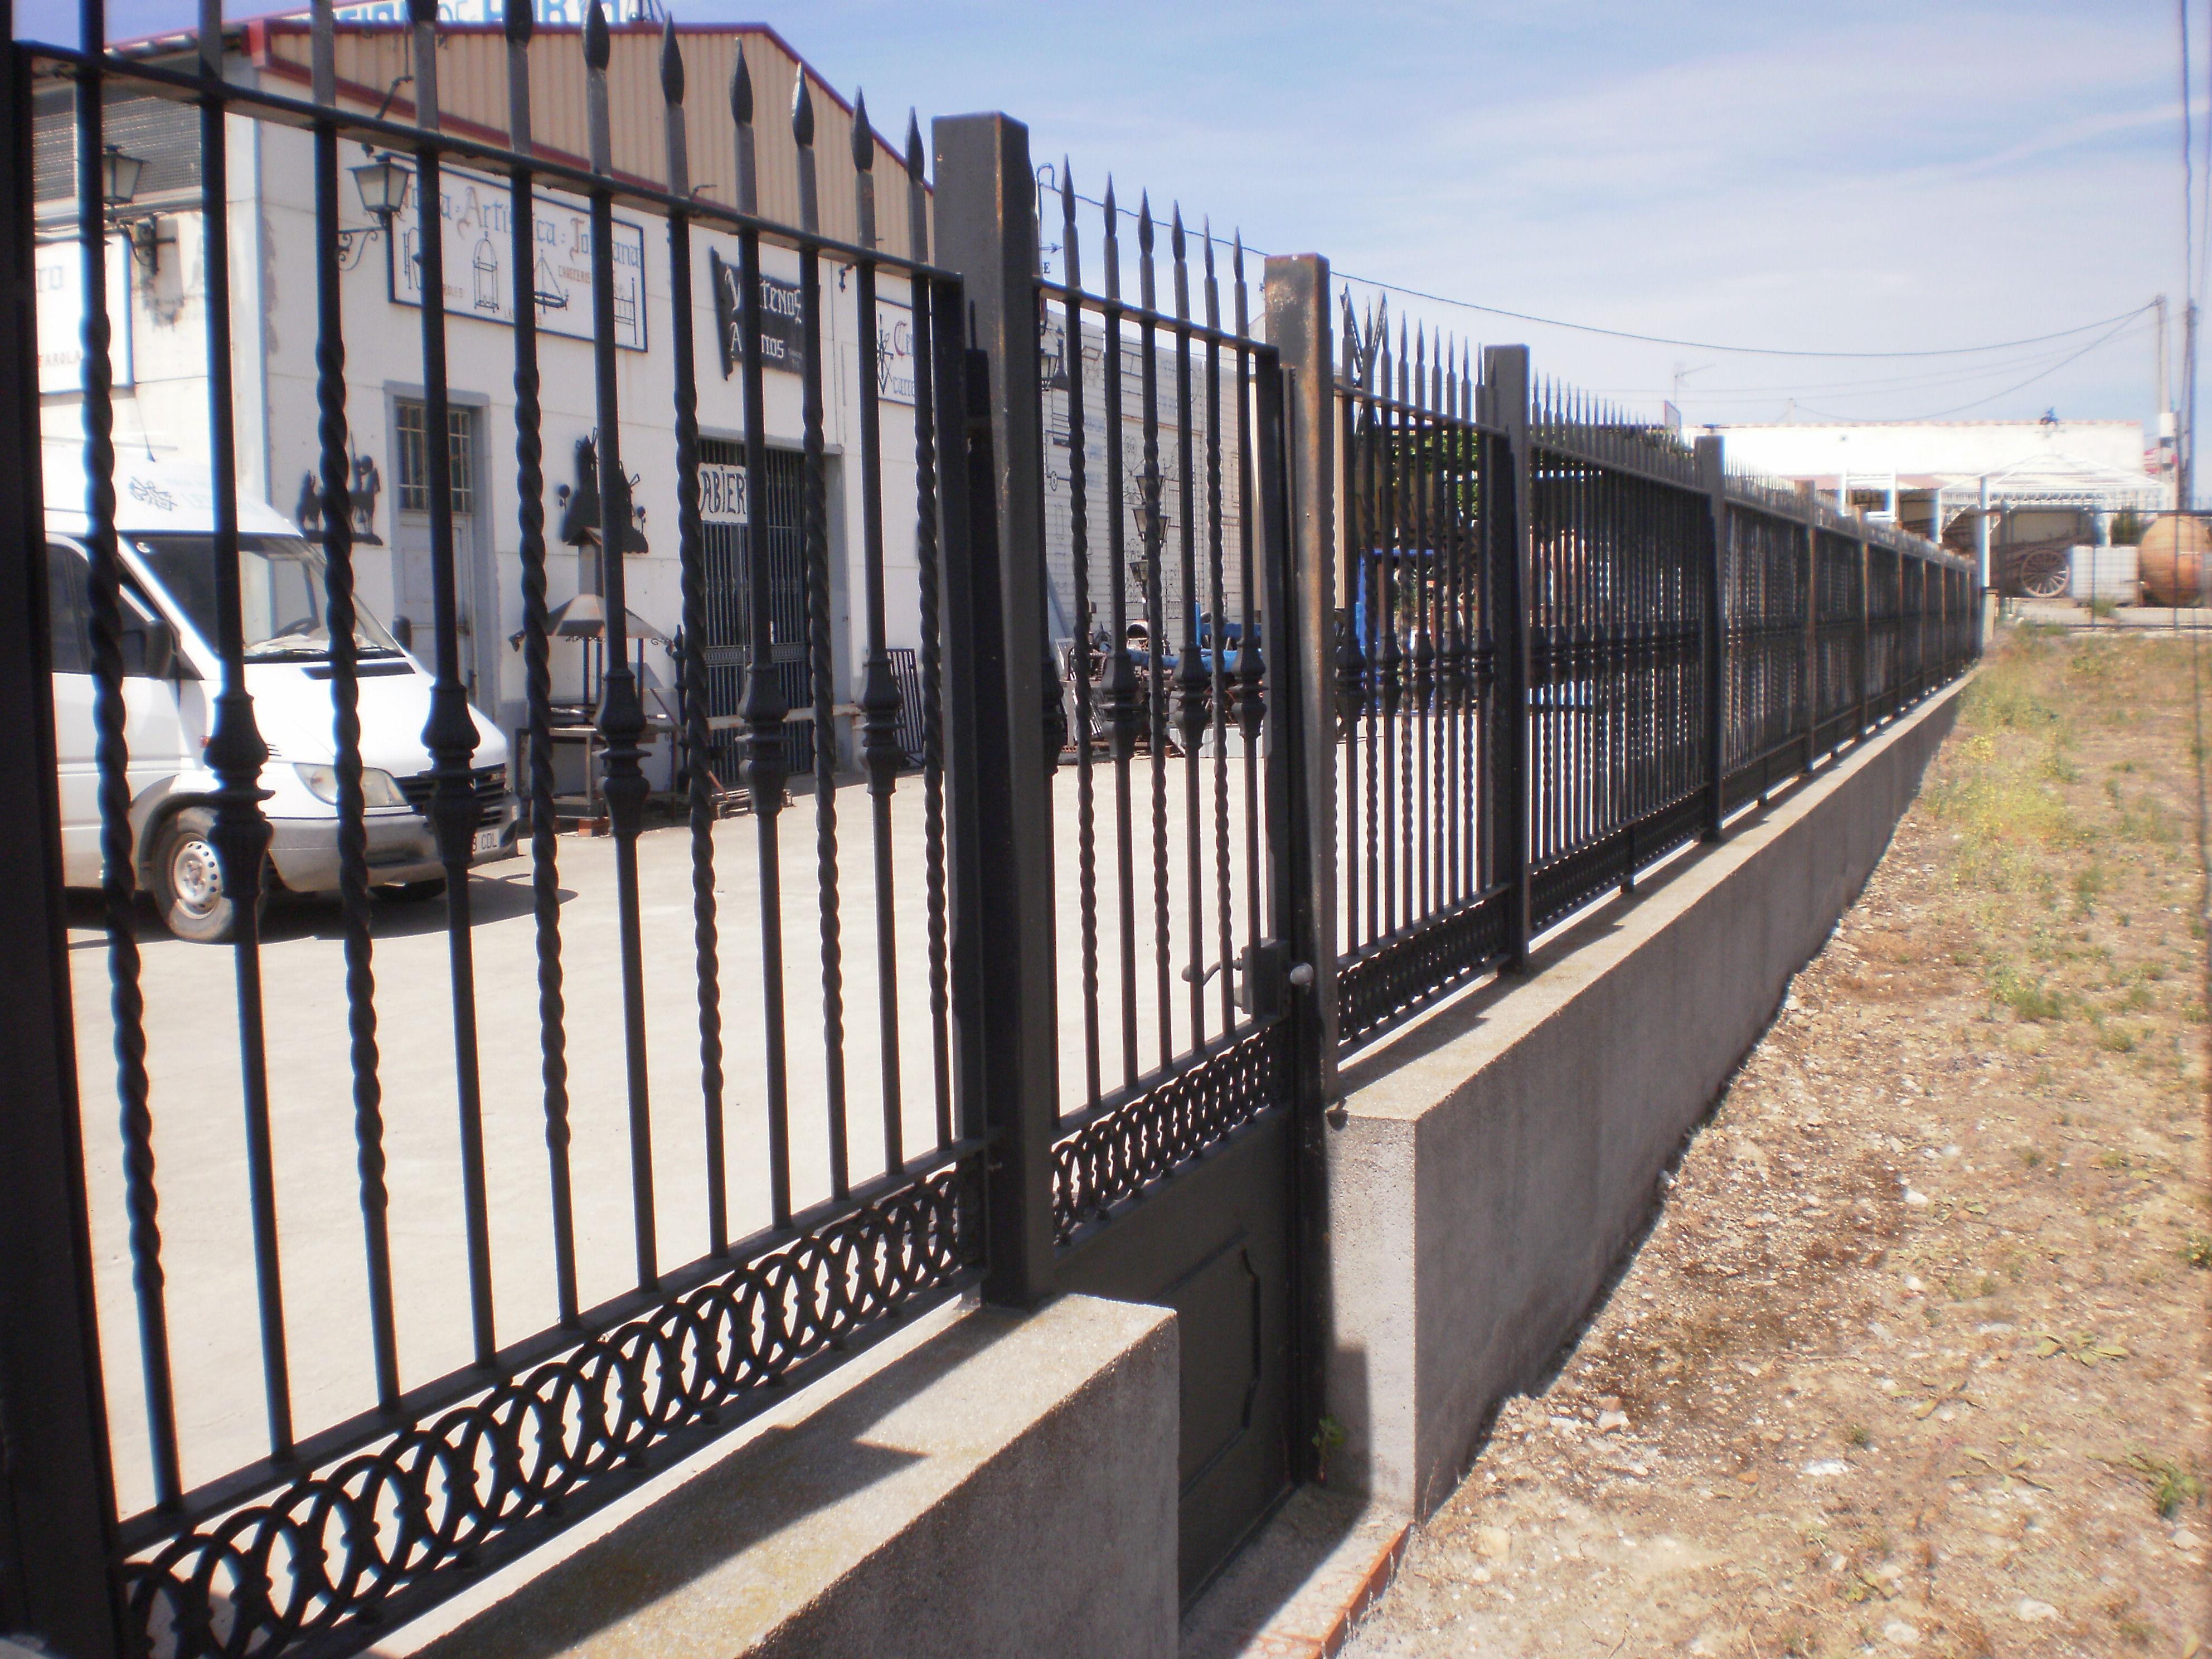 ... forja cancelas de forja balcones de forja puertas en forja barandillas